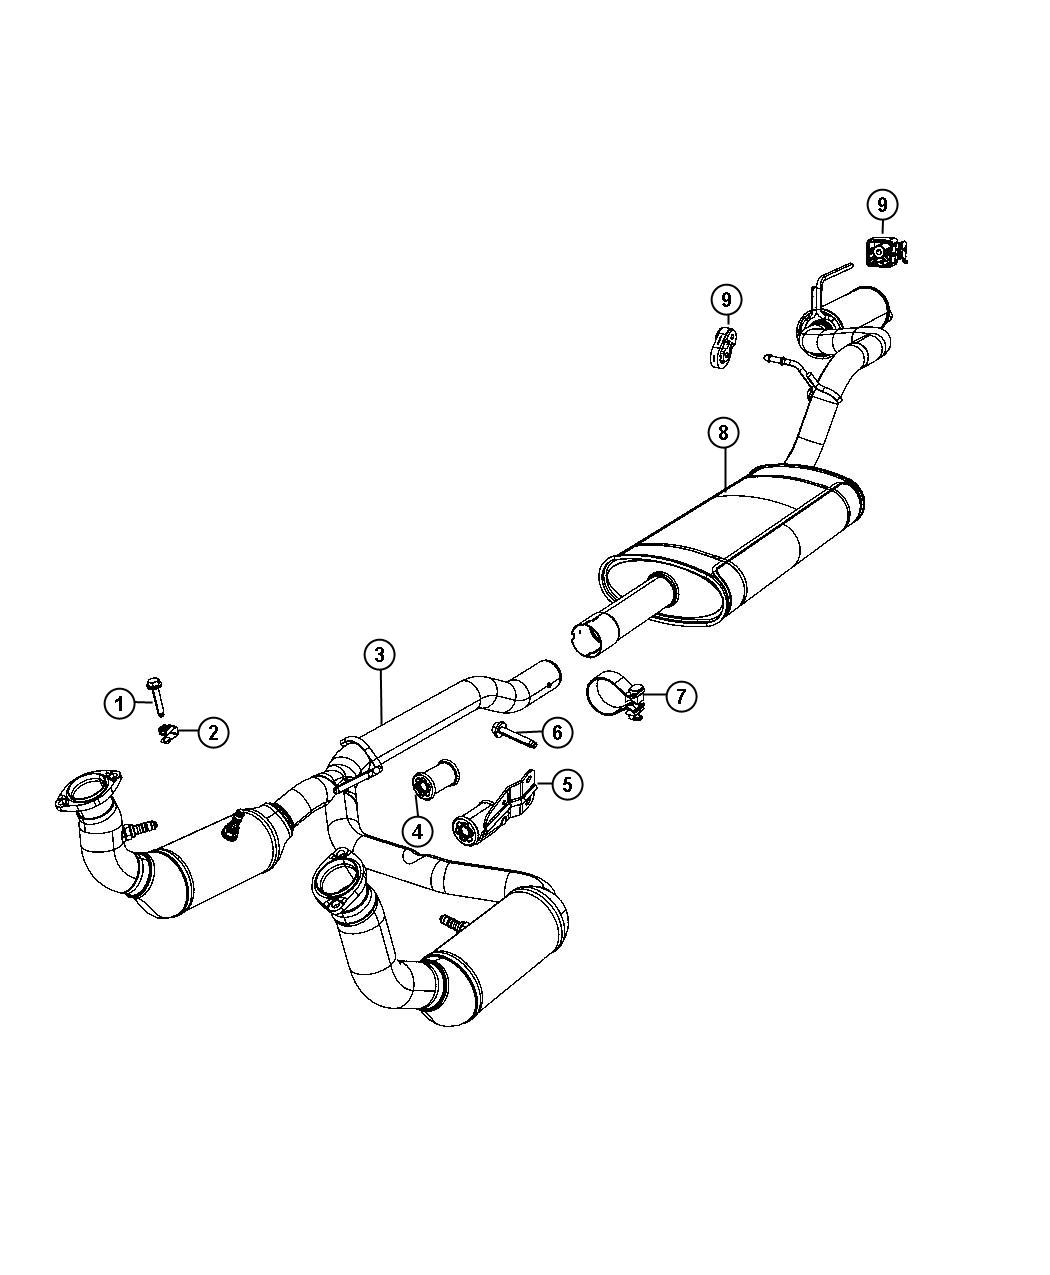 Dodge Nitro Converter Catalytic Exhaust System